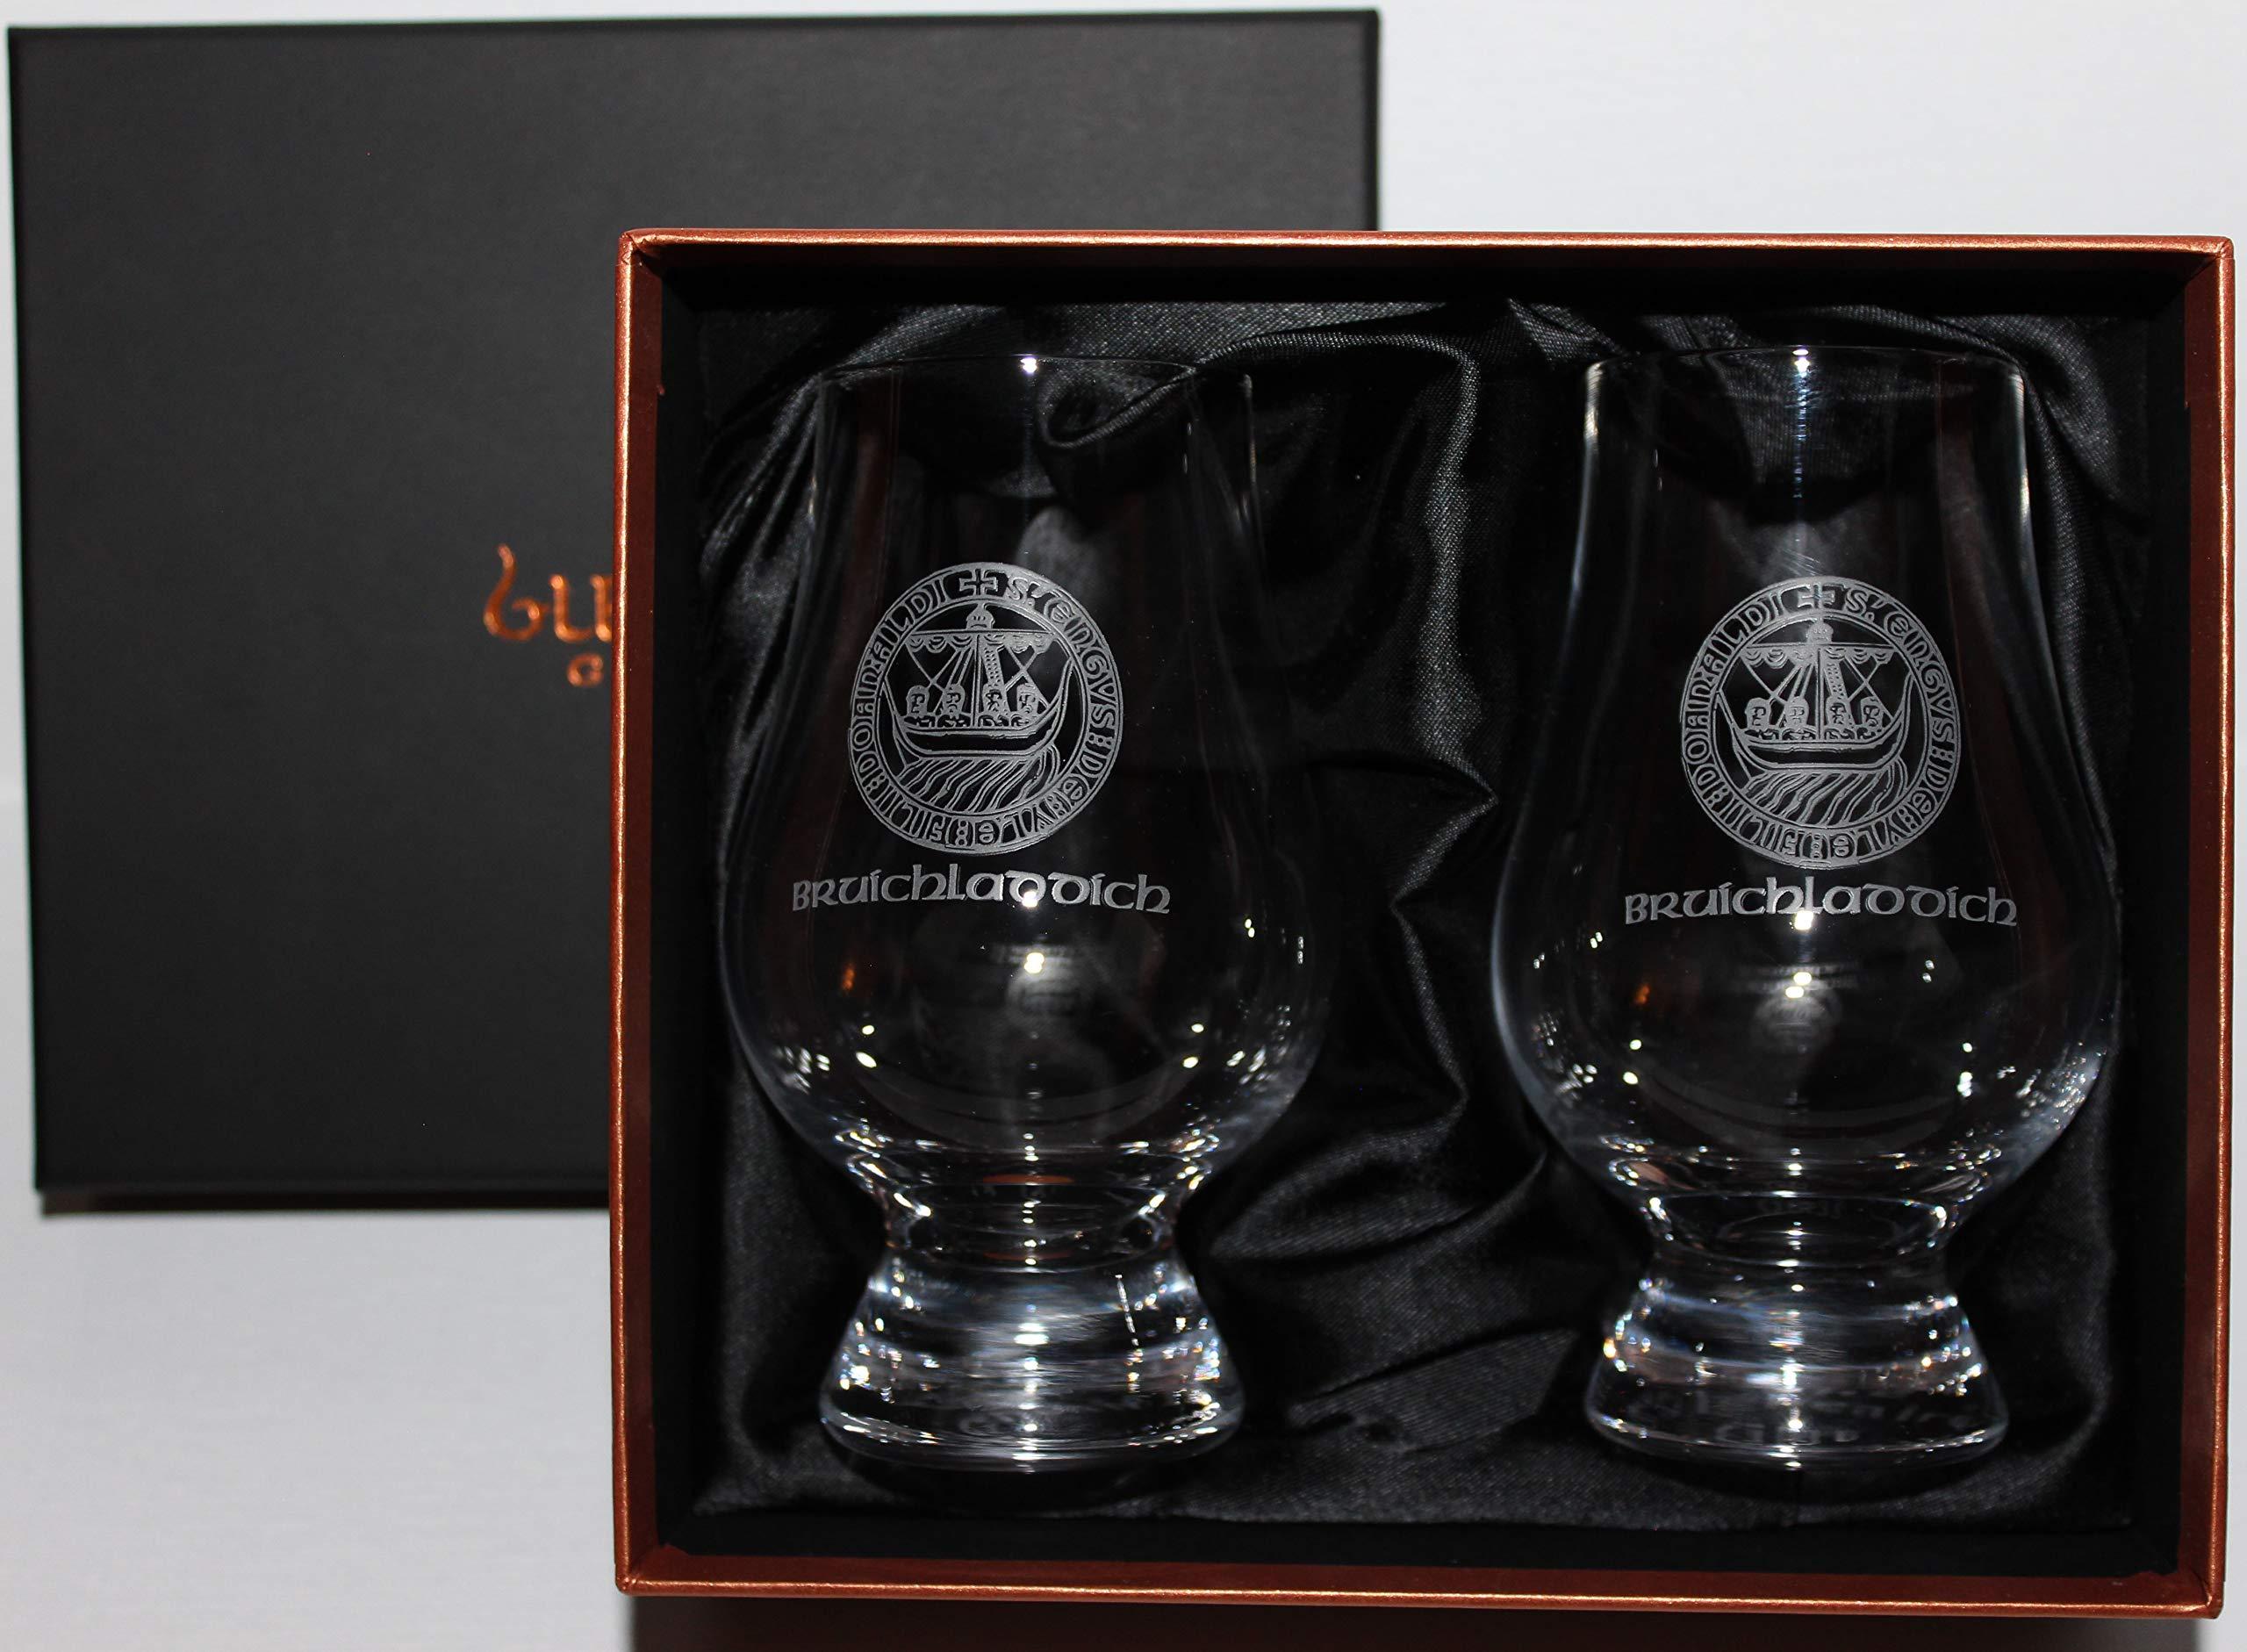 Bruichladdich Islay Crest Scotch Whisky Glencairn Two Glass Boxed Set